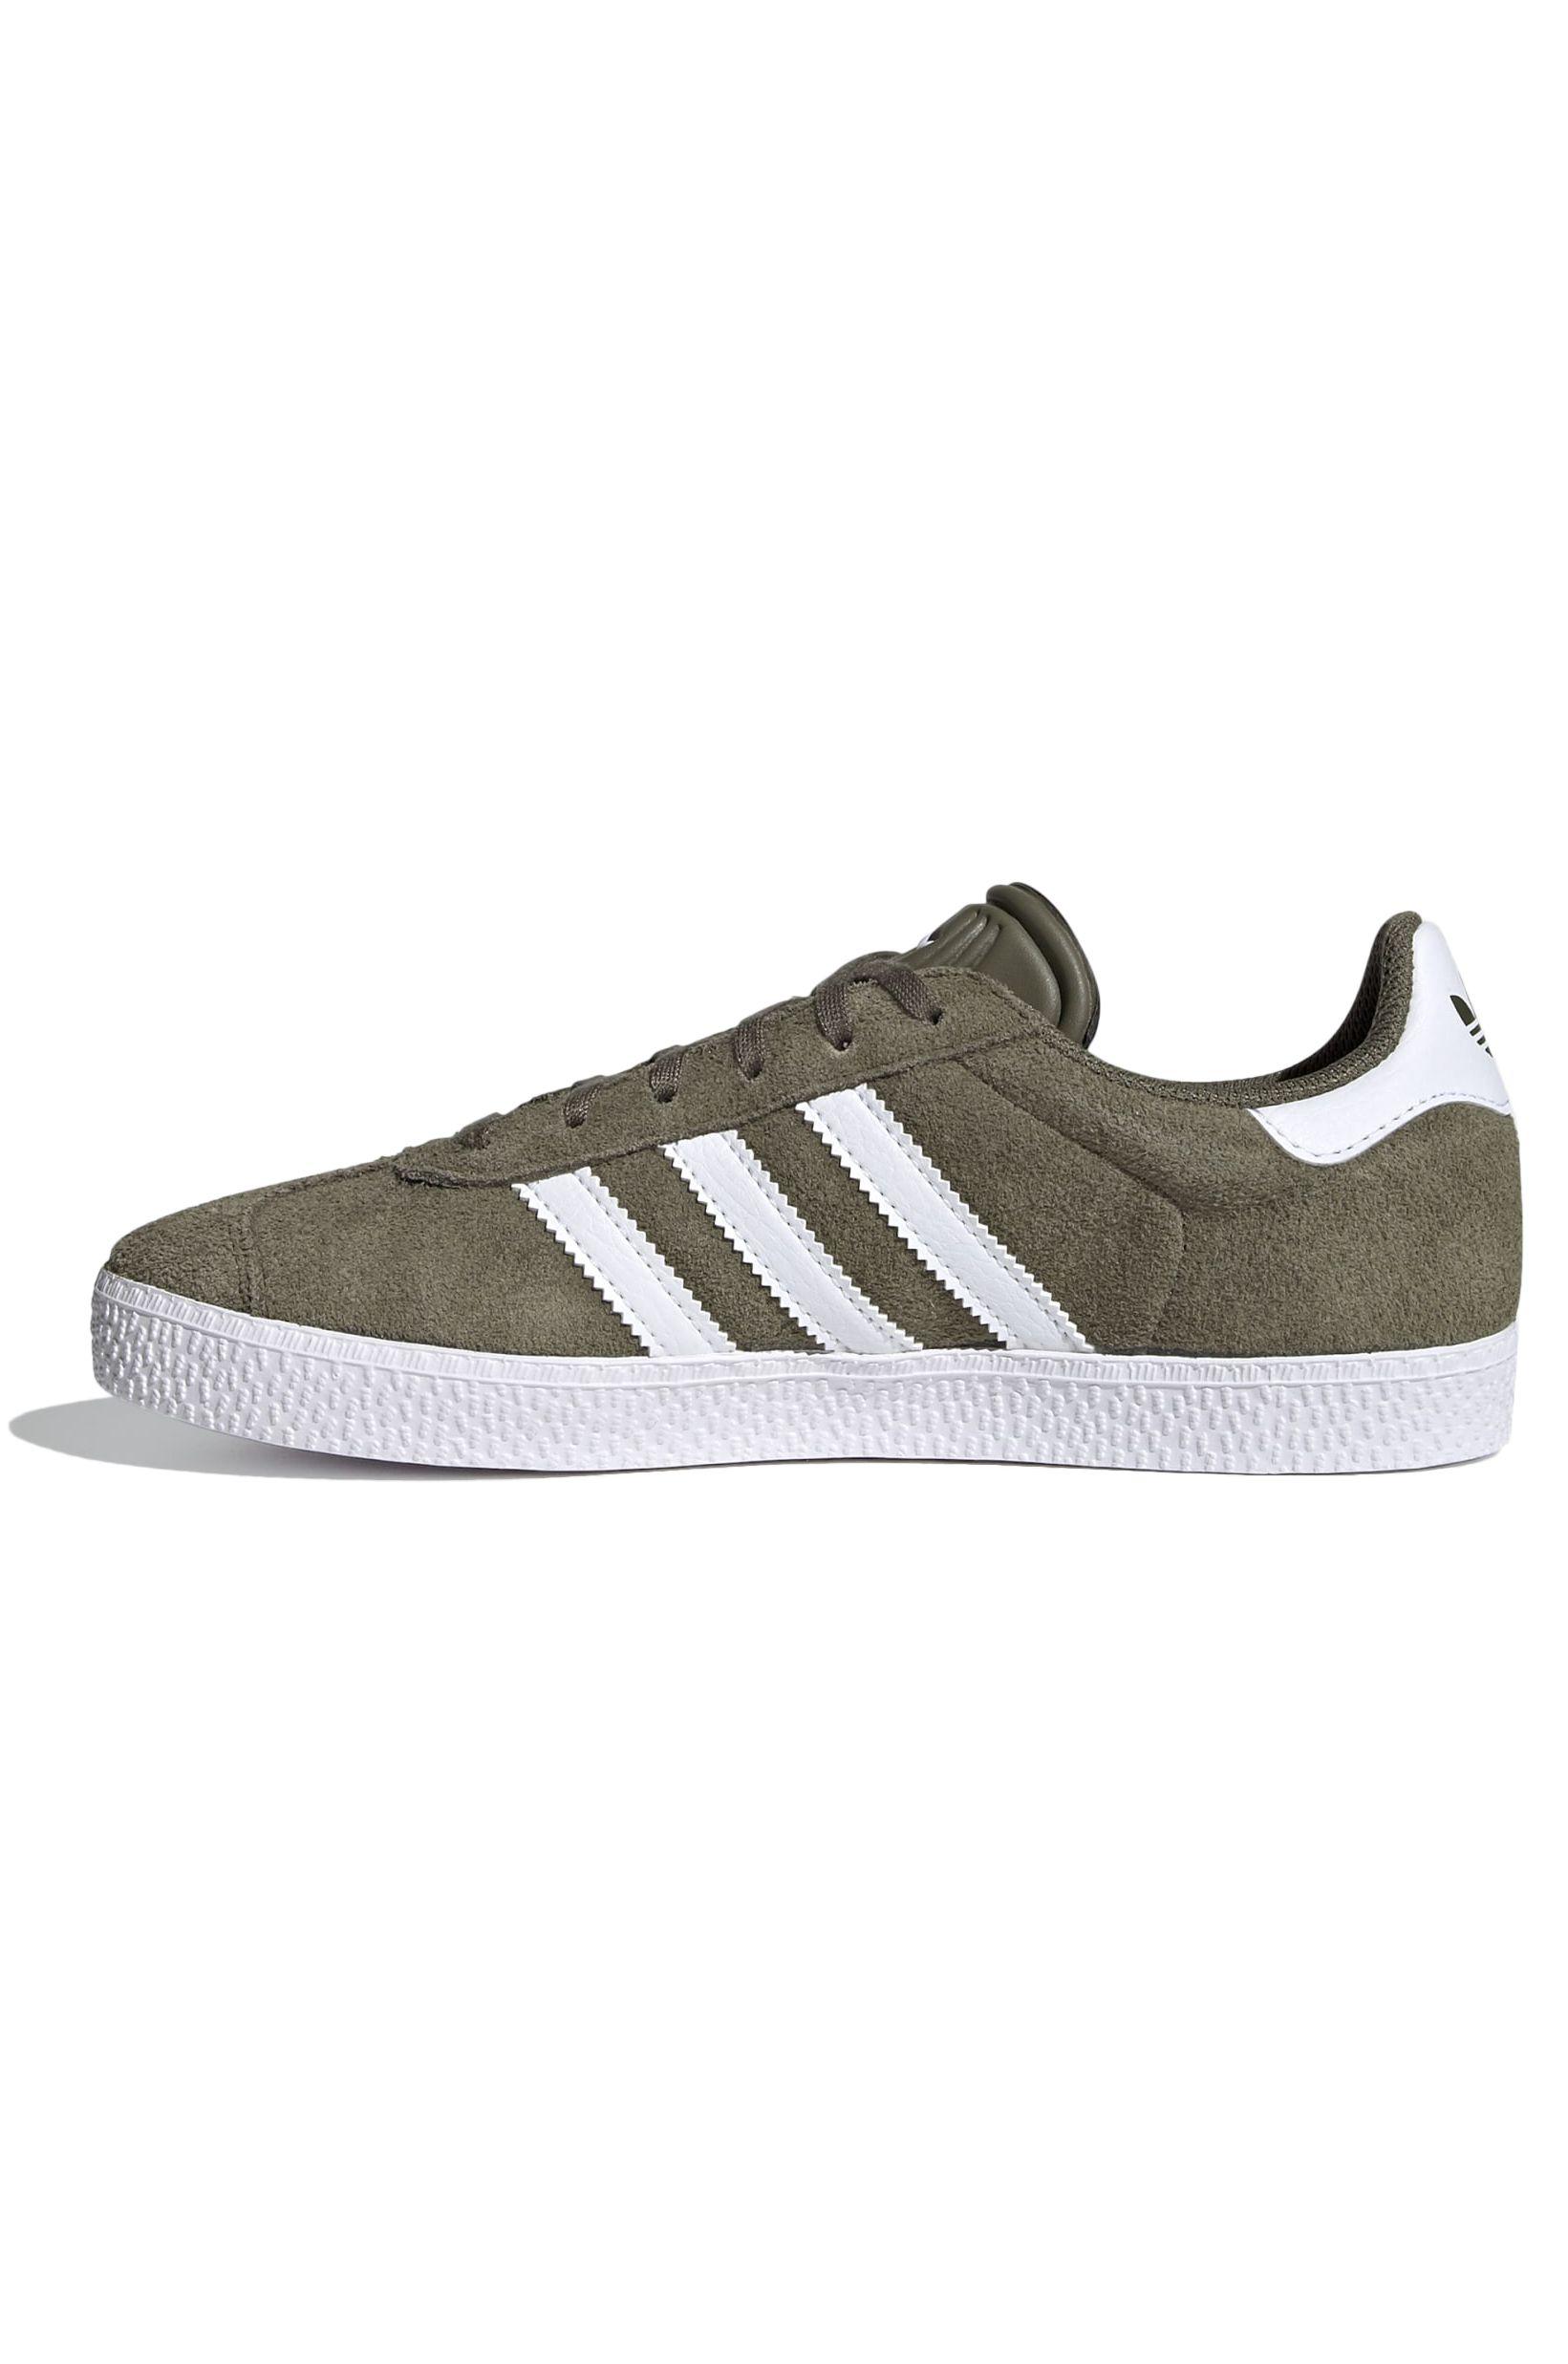 Adidas Shoes GAZELLE J Raw Khaki/Ftwr White/Ftwr White